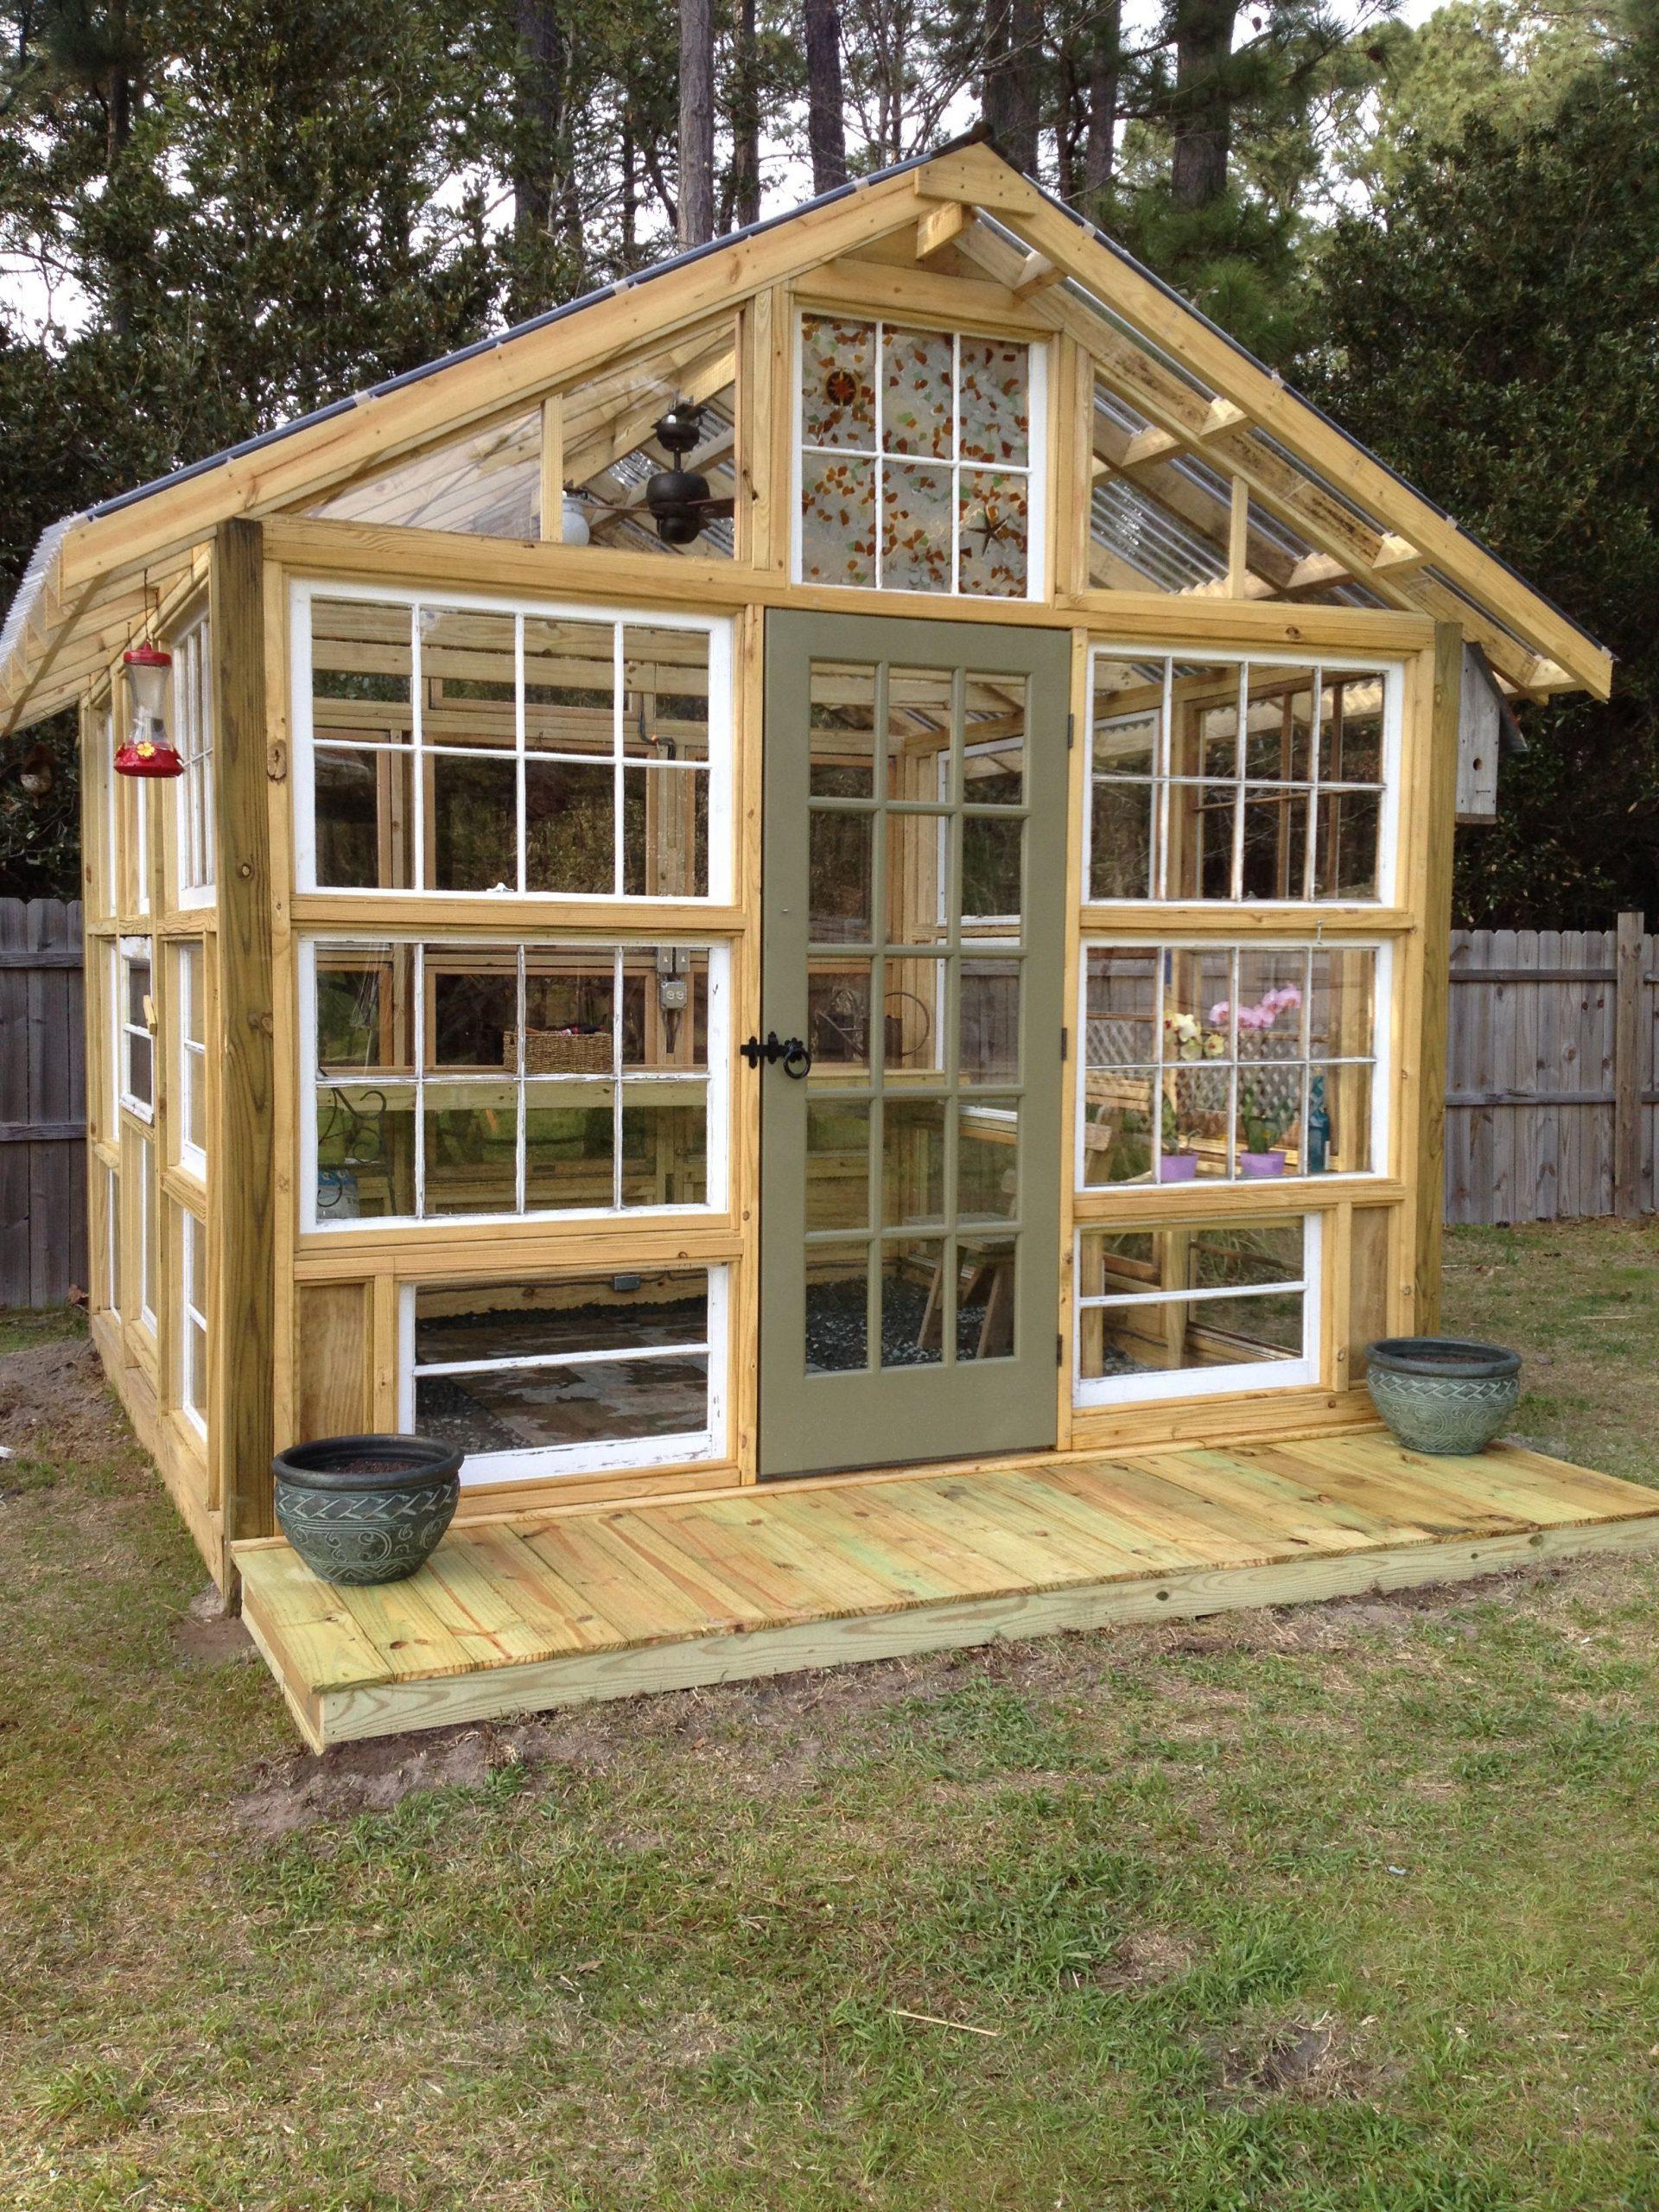 Green House Made Using Old Windows | Serre Jardin, Maison ... concernant Construire Jardin Surélevé